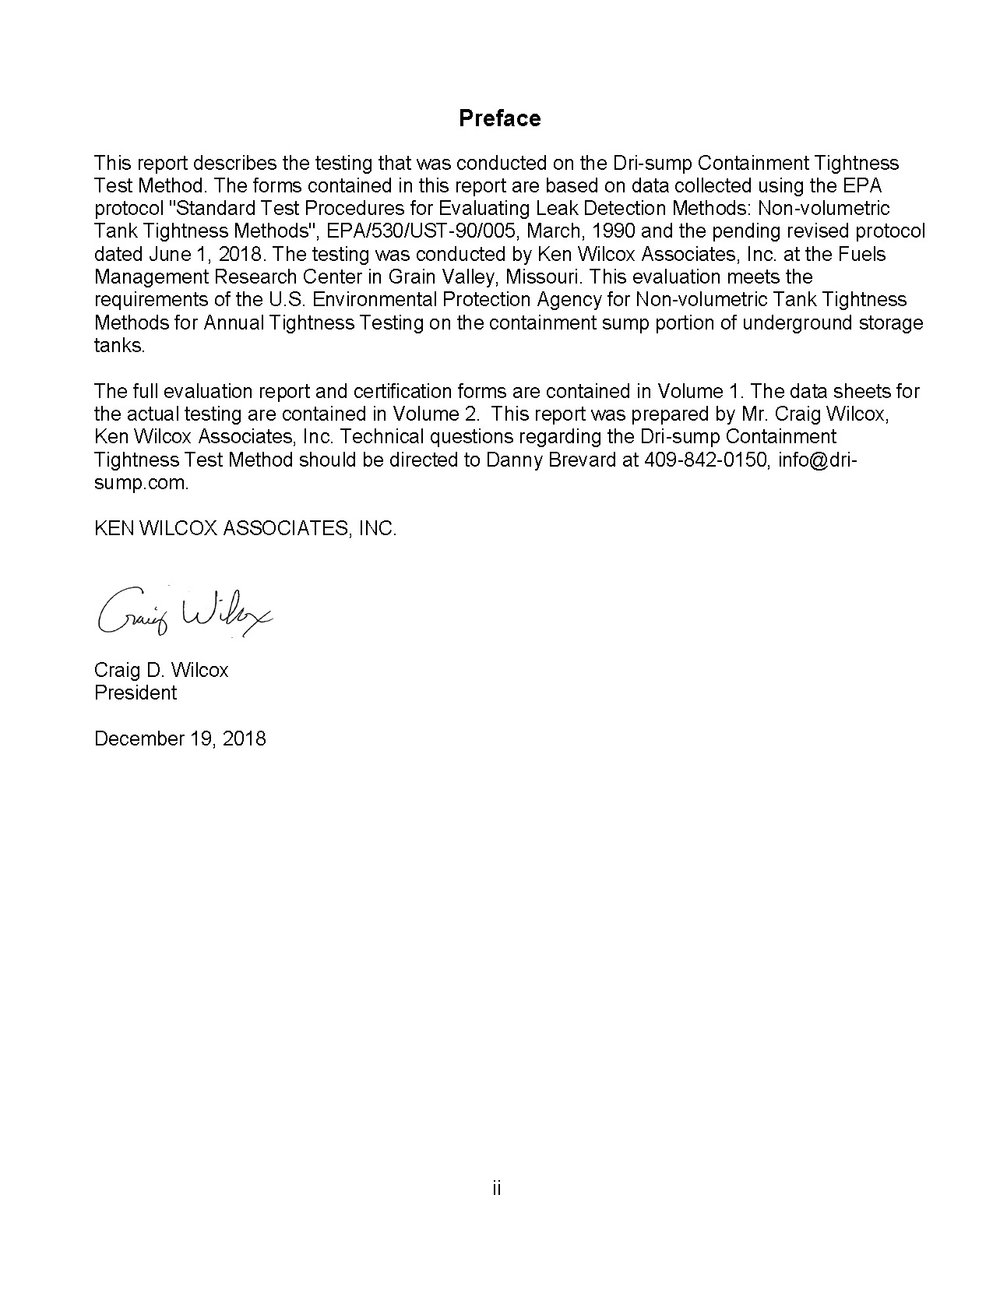 KWA Final Report Dri Sump 12 19 2018_Page_03.jpg